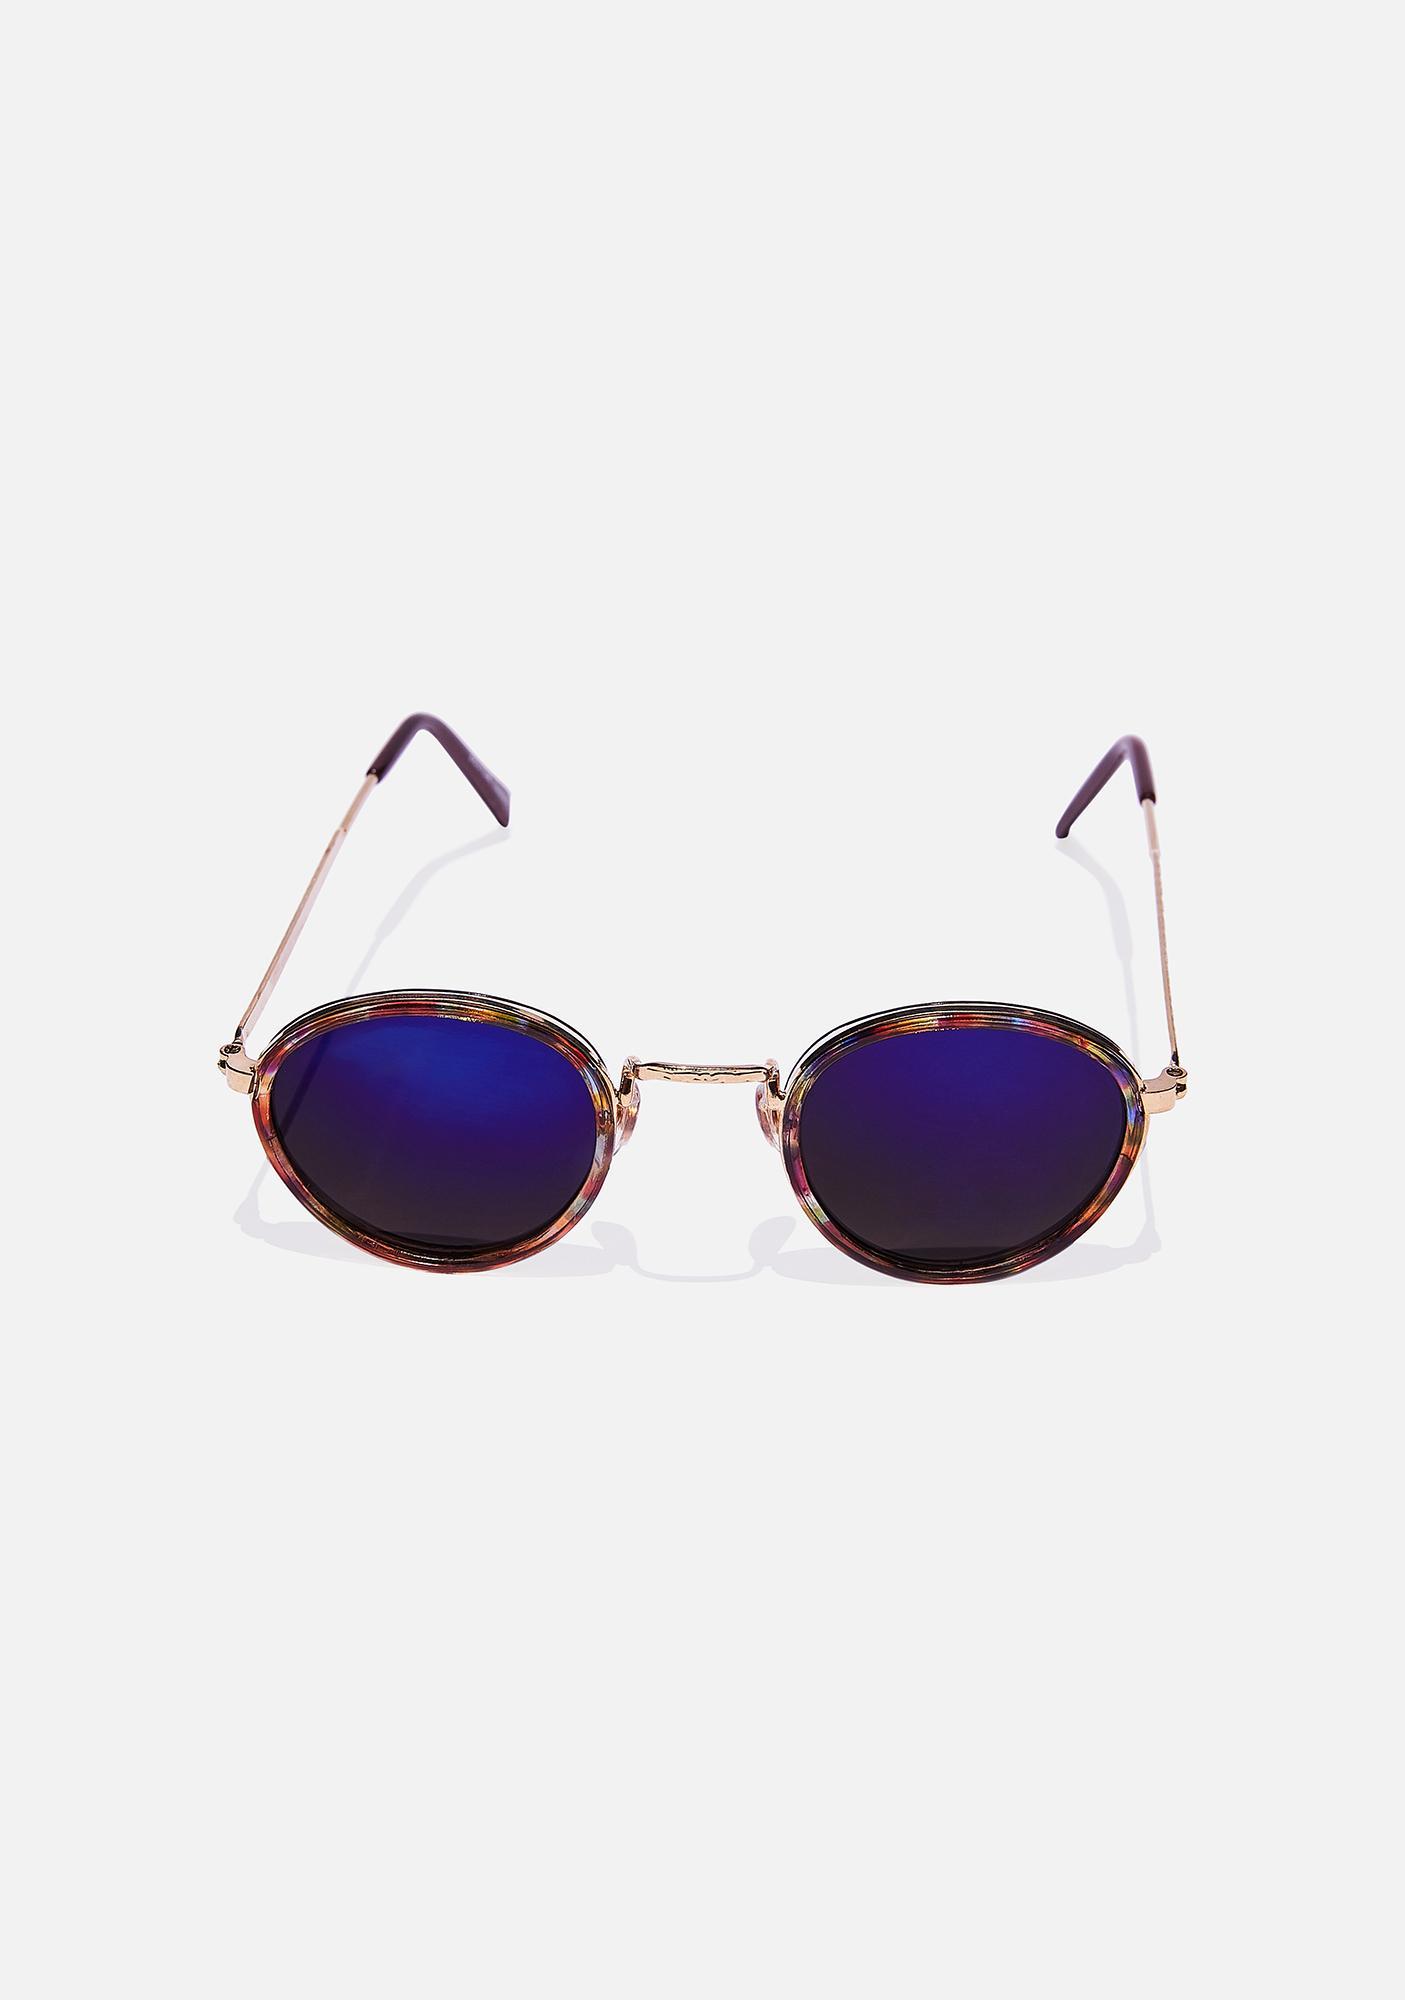 Good Times Eyewear Blue Revo Rounders Sunglasses